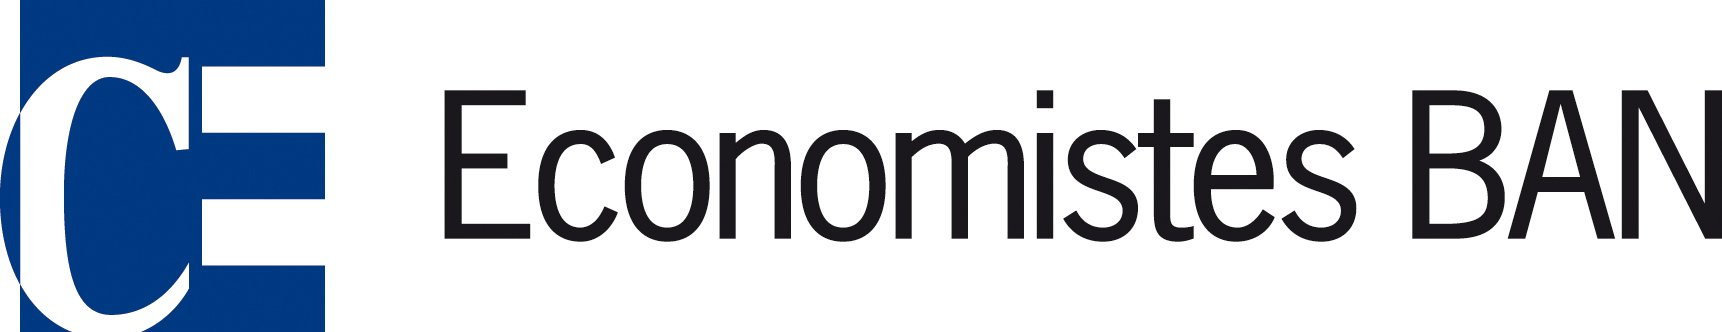 col_economistes_logo